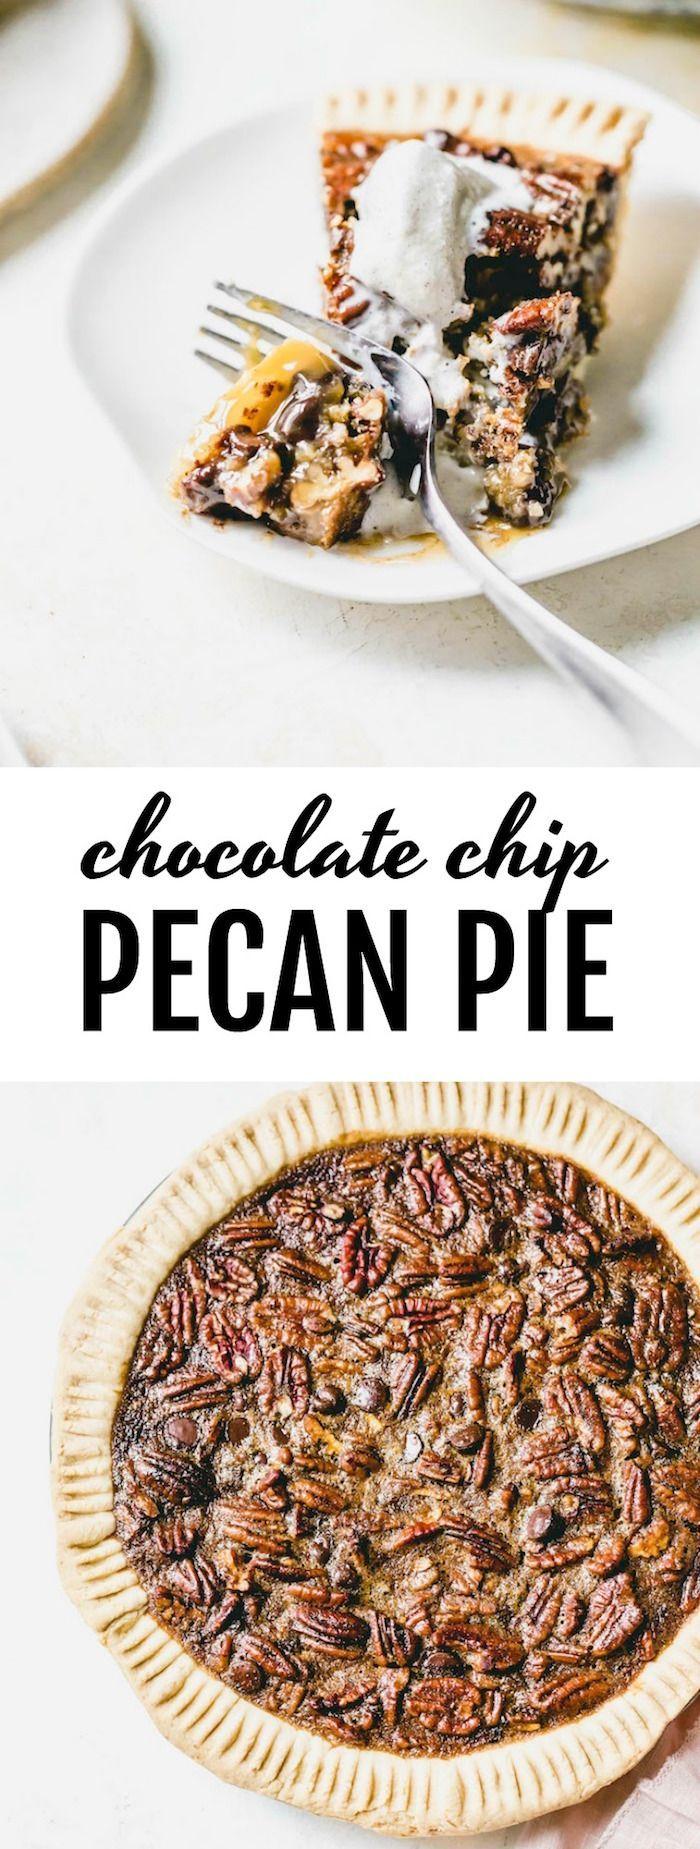 Chocolate Chip Pecan Pie #pecanpierecipe